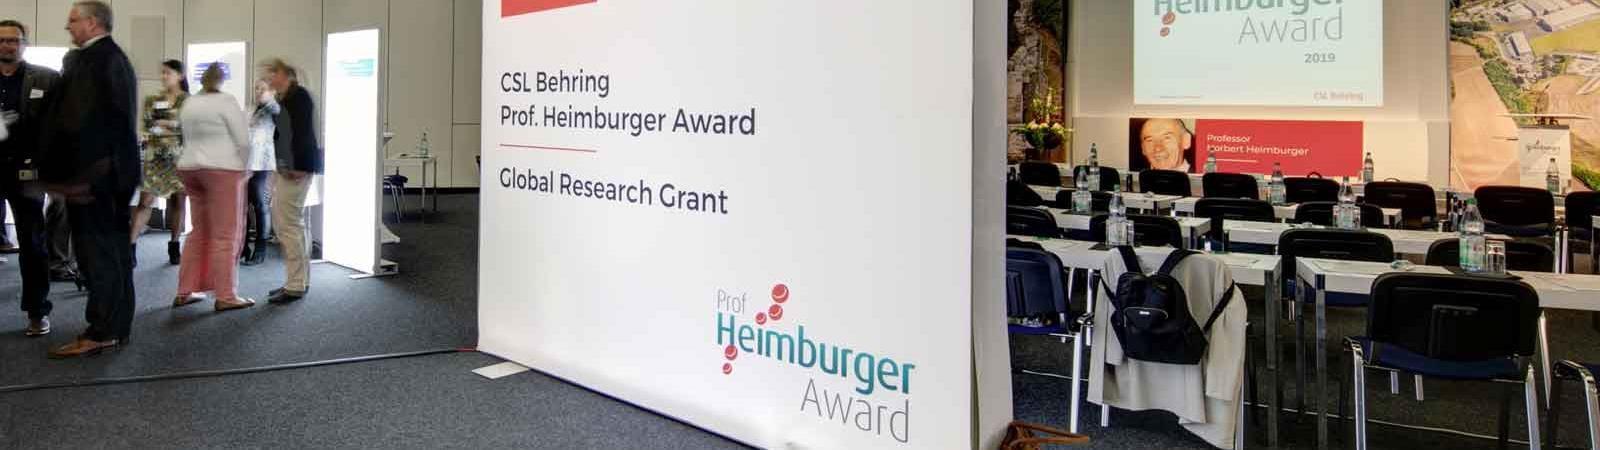 Professor Heimburger Awards